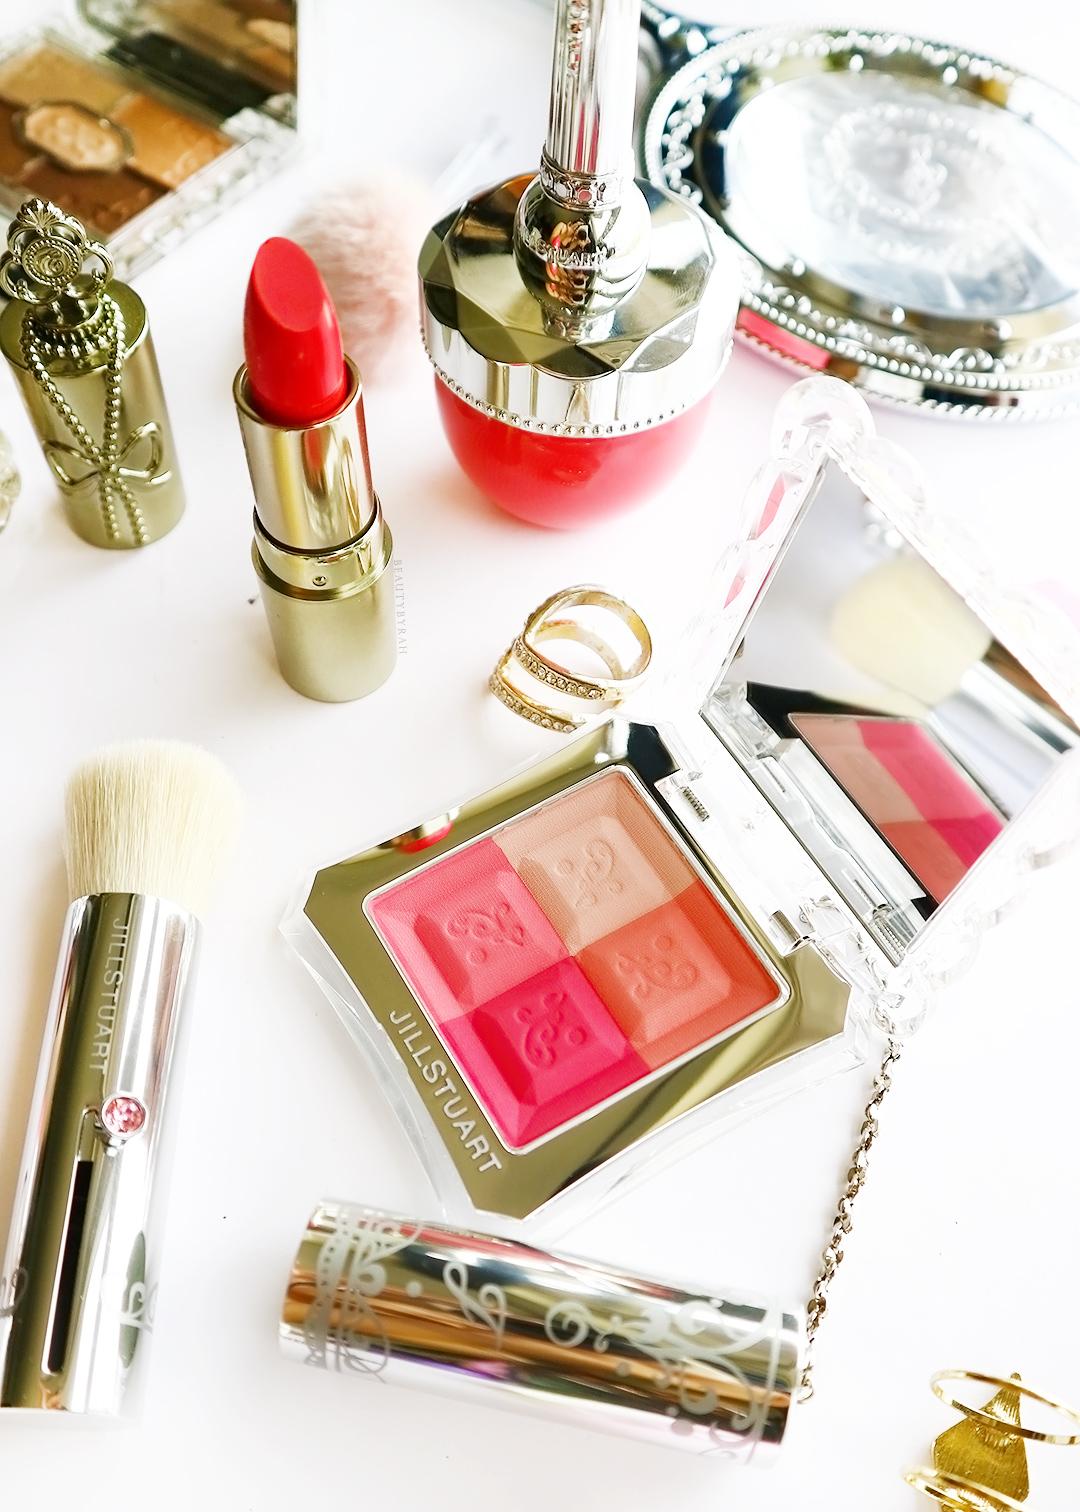 Jill Stuart Beauty Mix Blush Compact Singapore Review